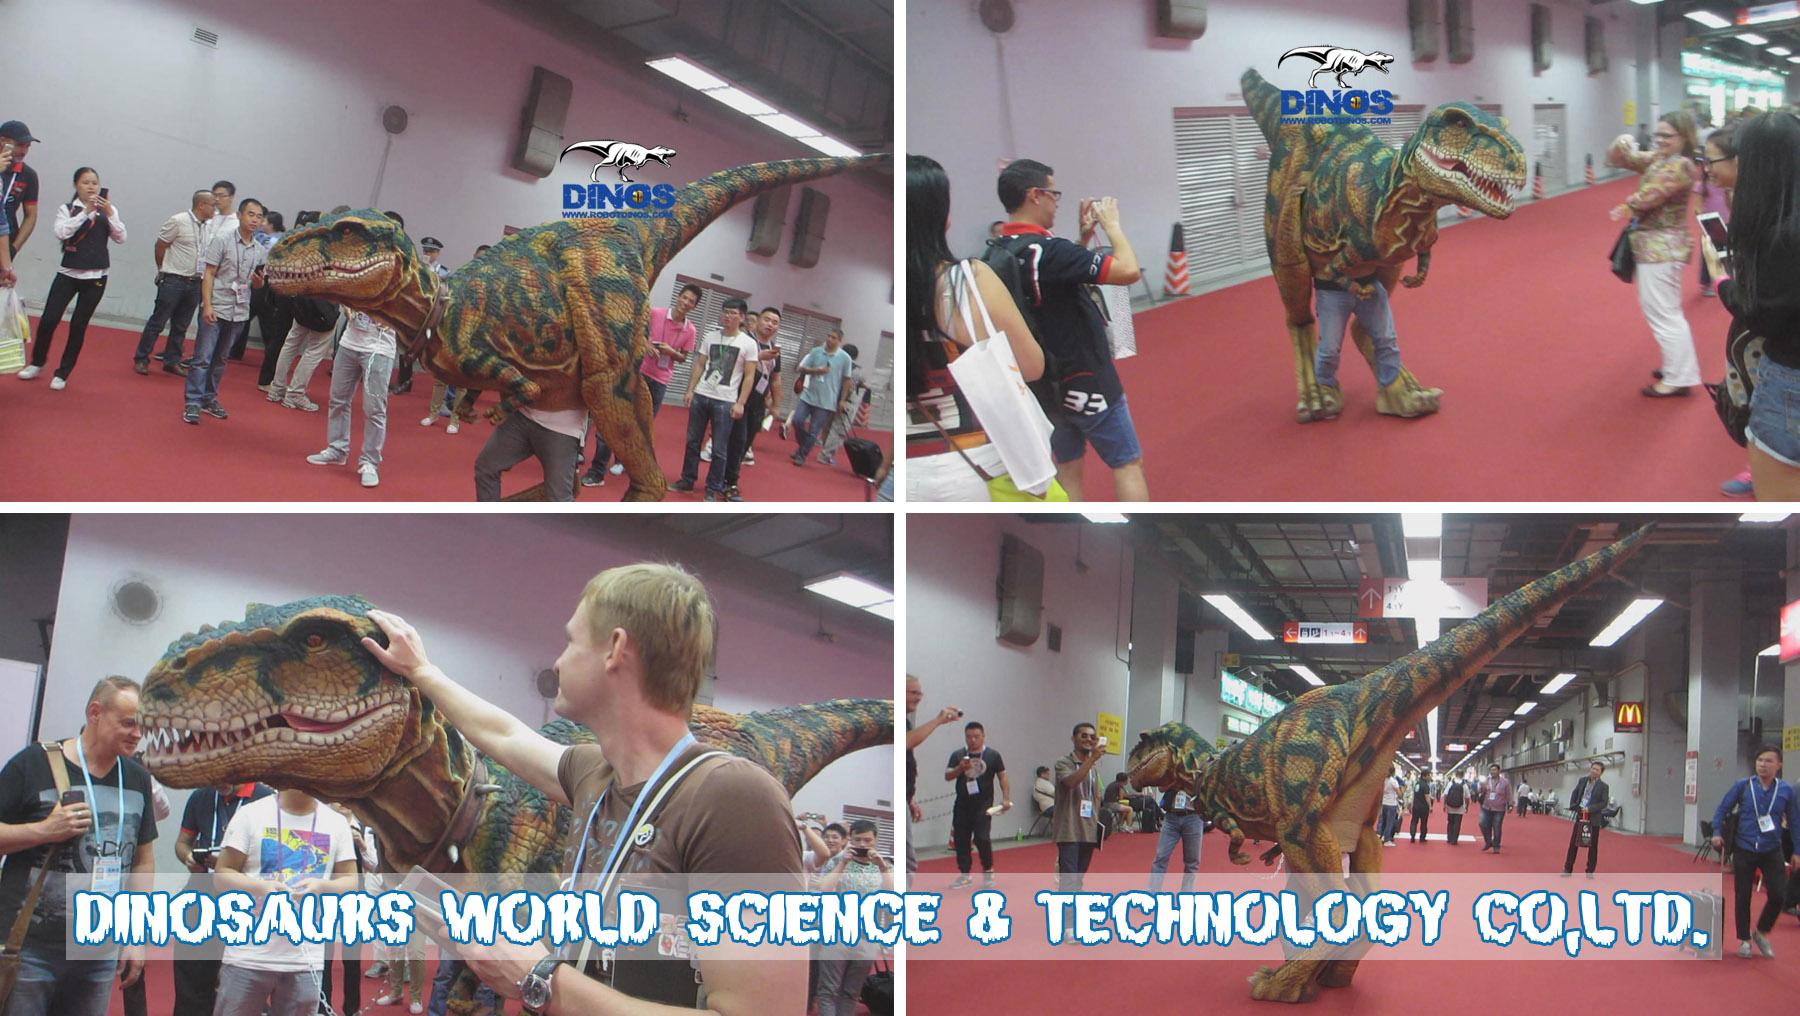 walking dinosaur puppet,dinosaur costume,animatronic dinosaur costume,robotic dinosaur puppet